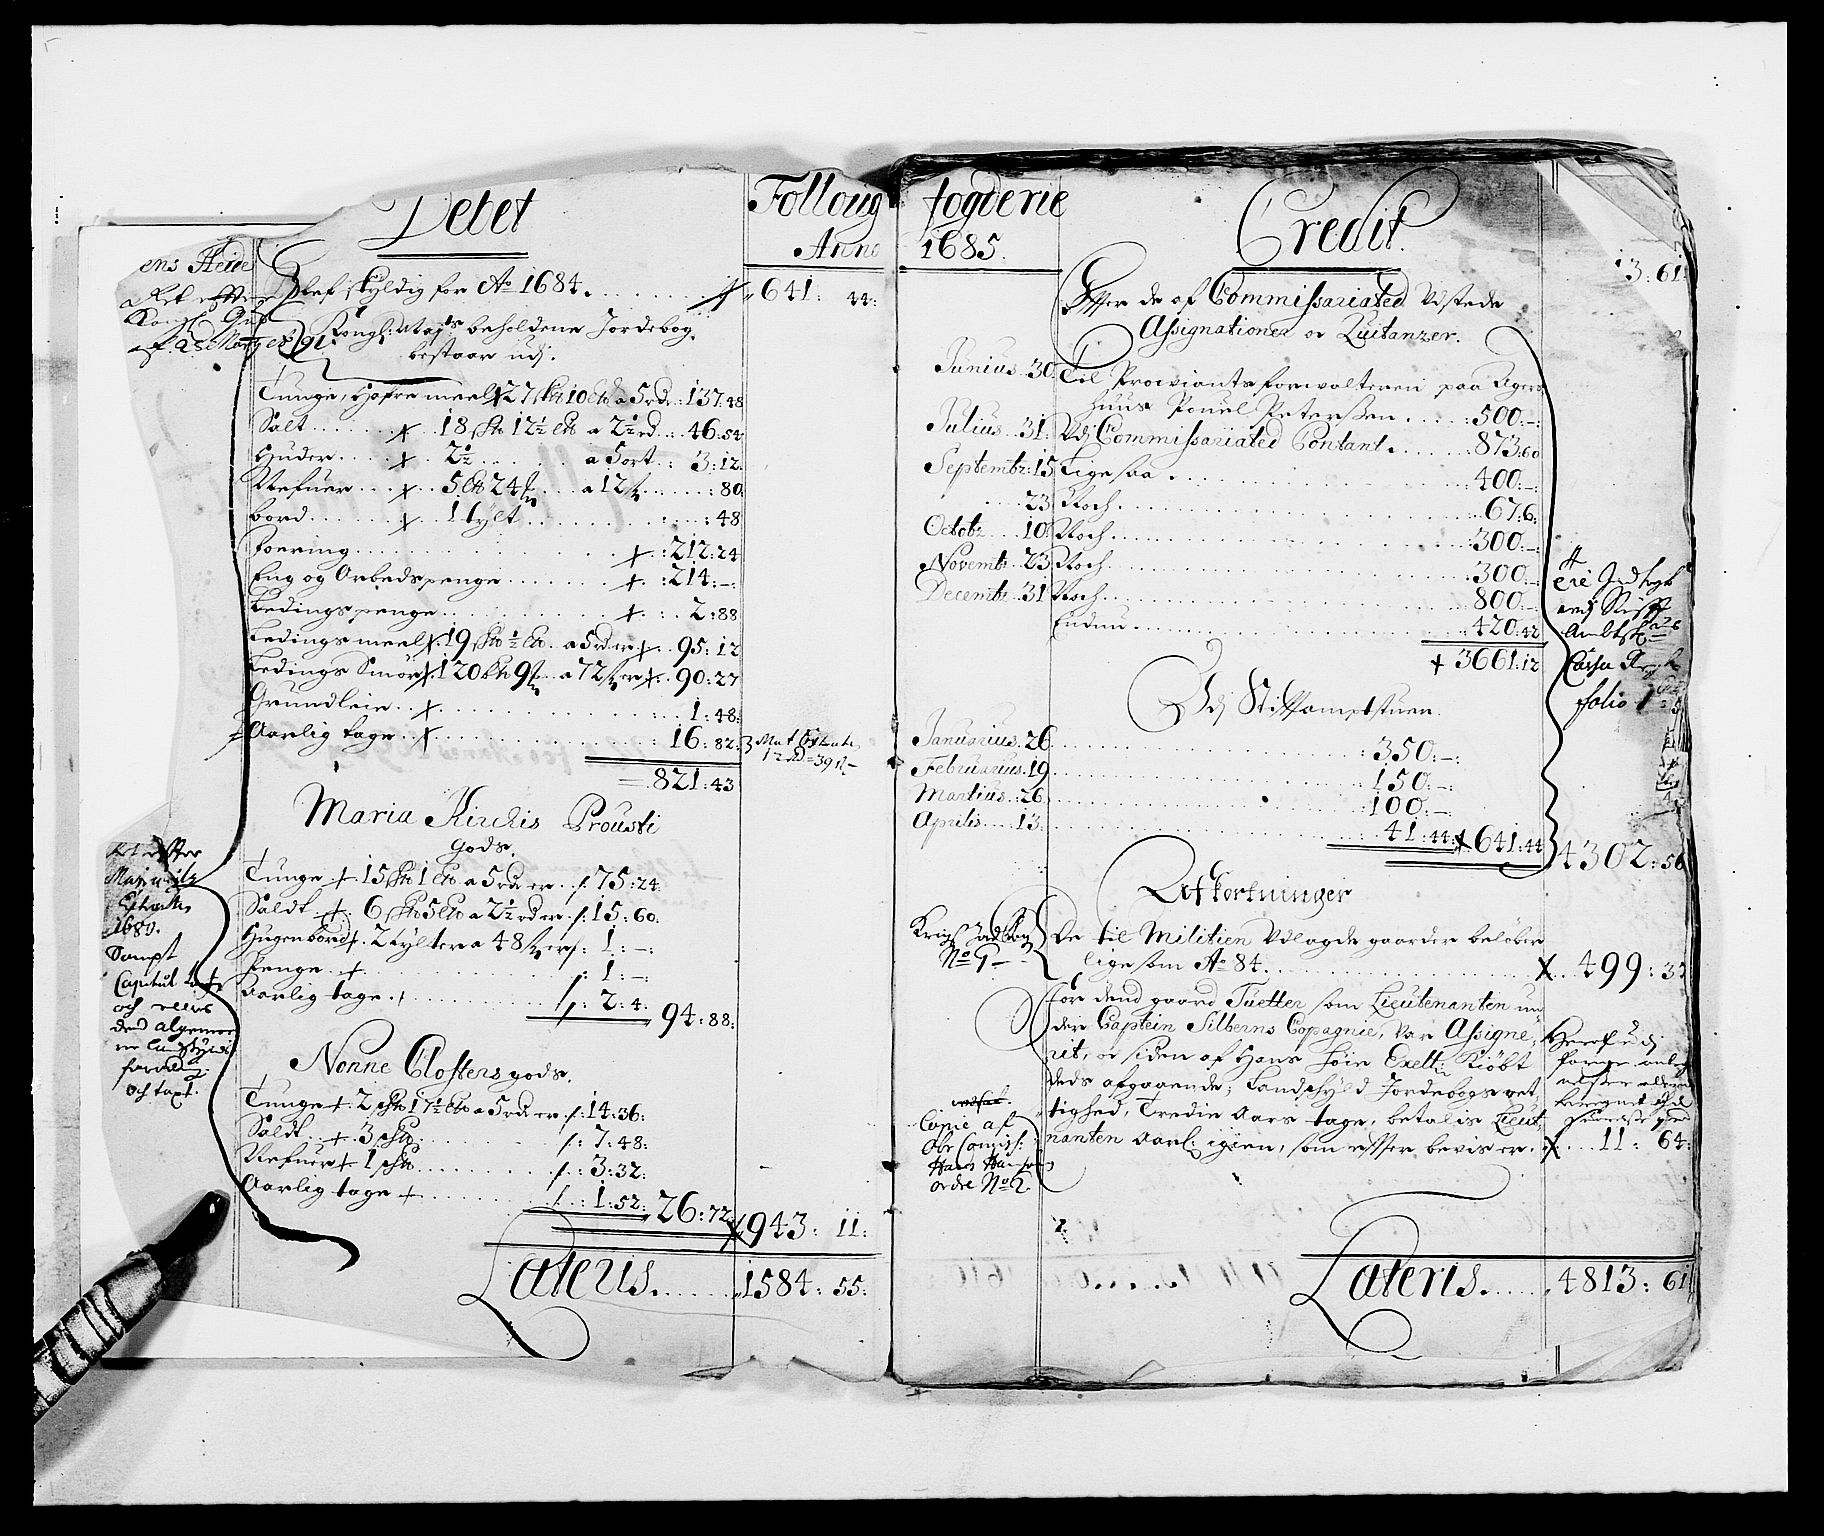 RA, Rentekammeret inntil 1814, Reviderte regnskaper, Fogderegnskap, R09/L0436: Fogderegnskap Follo, 1685-1691, s. 3